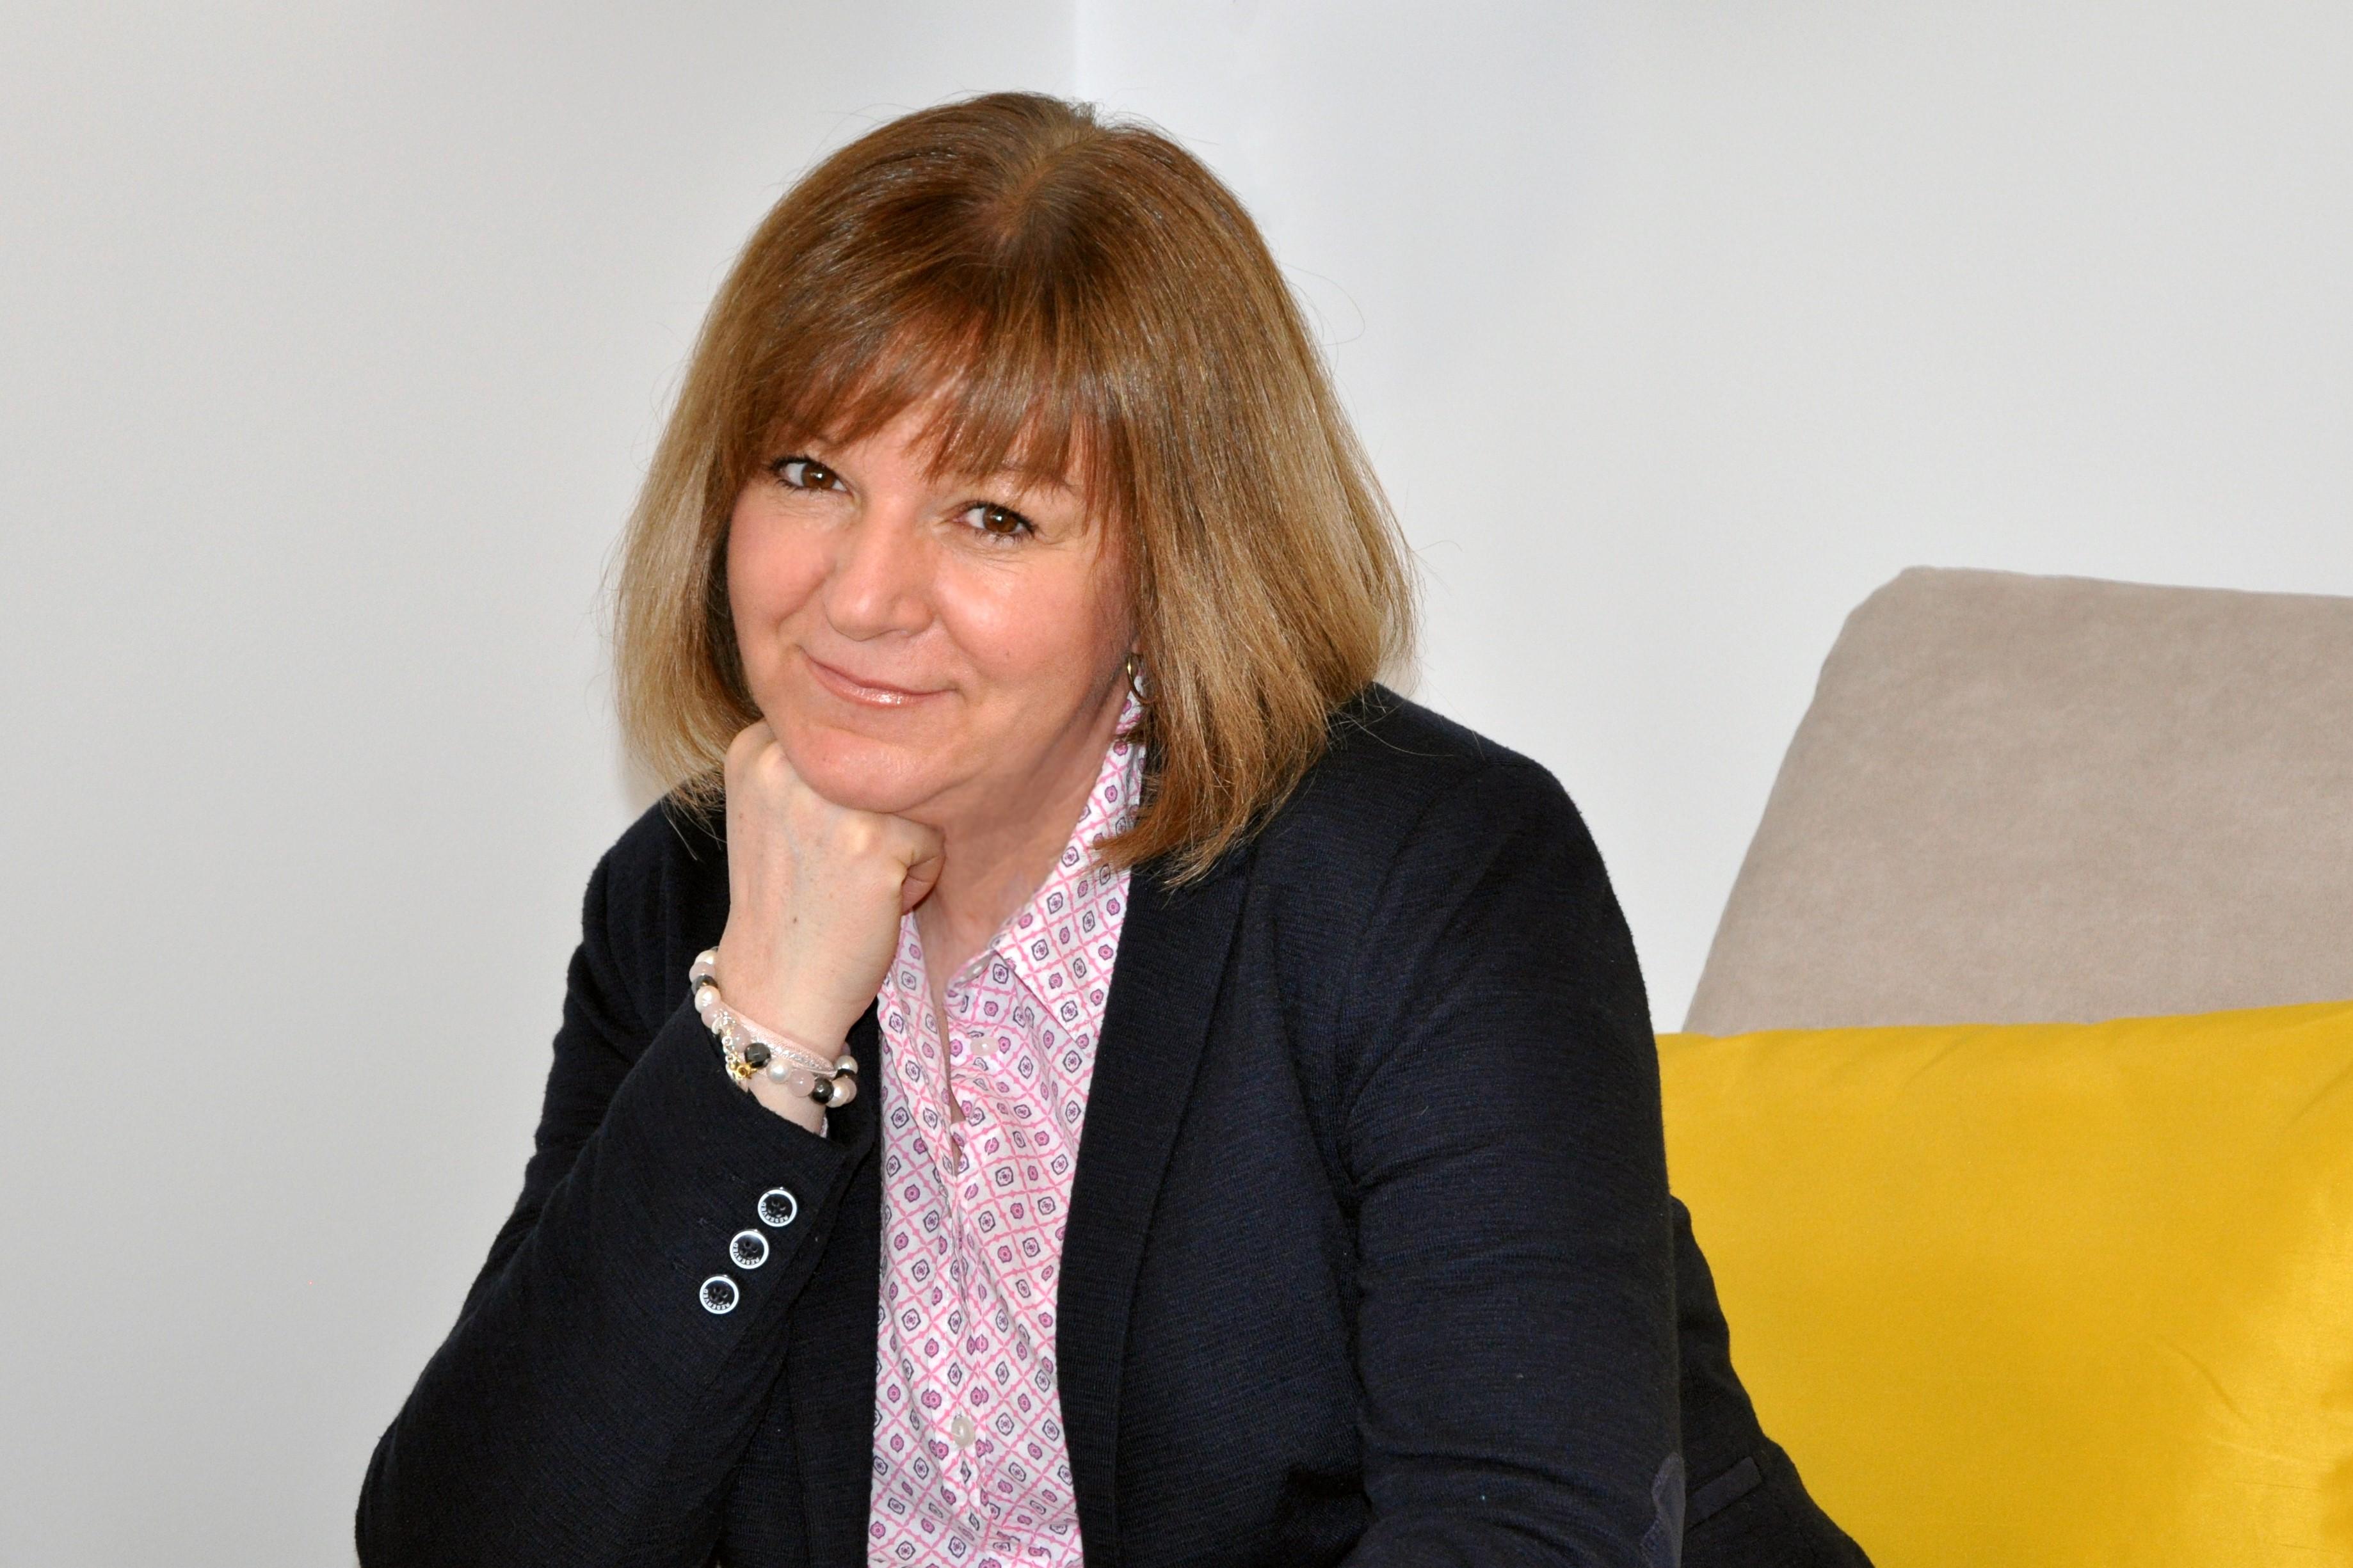 Ing. Mária Drahošová, ACC